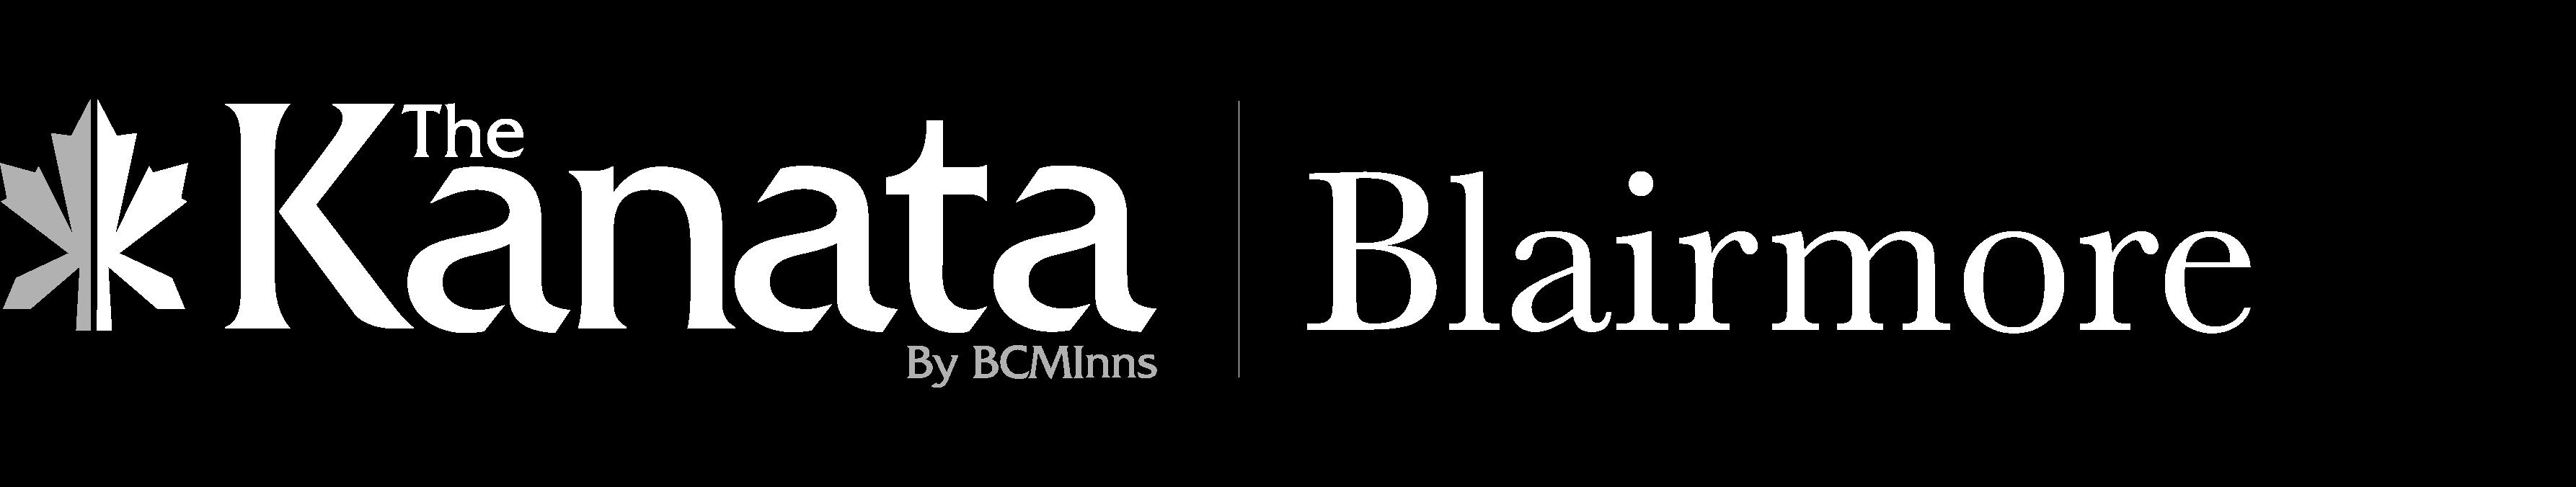 kanata hotels in blairmore logo